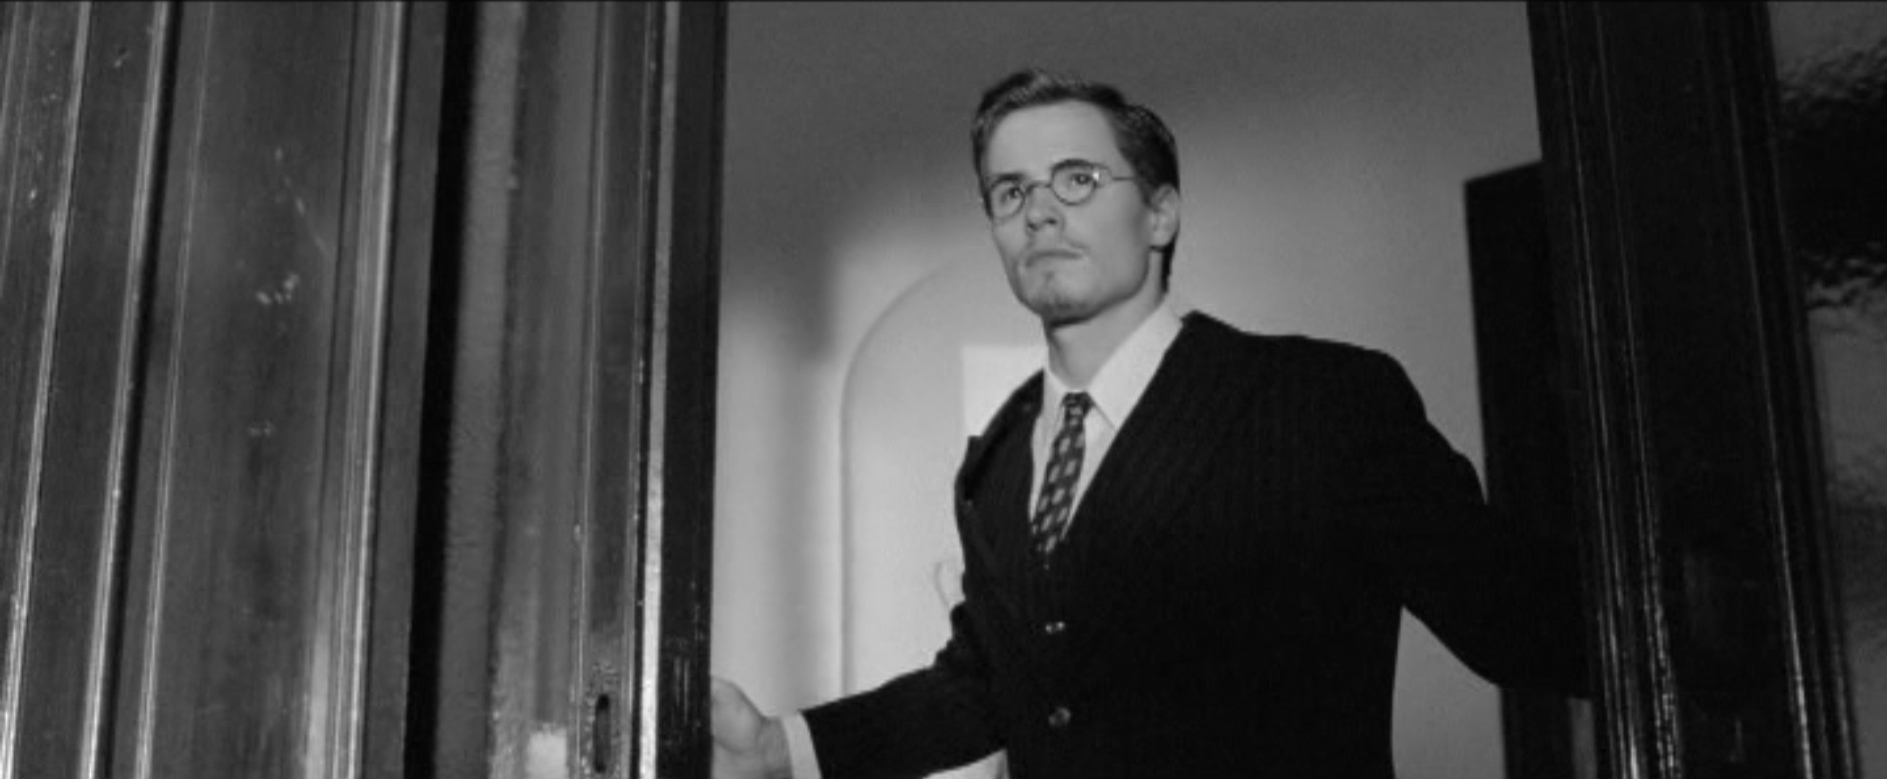 Martin Goeres Schauspieler, Martin Goeres Film 1949,